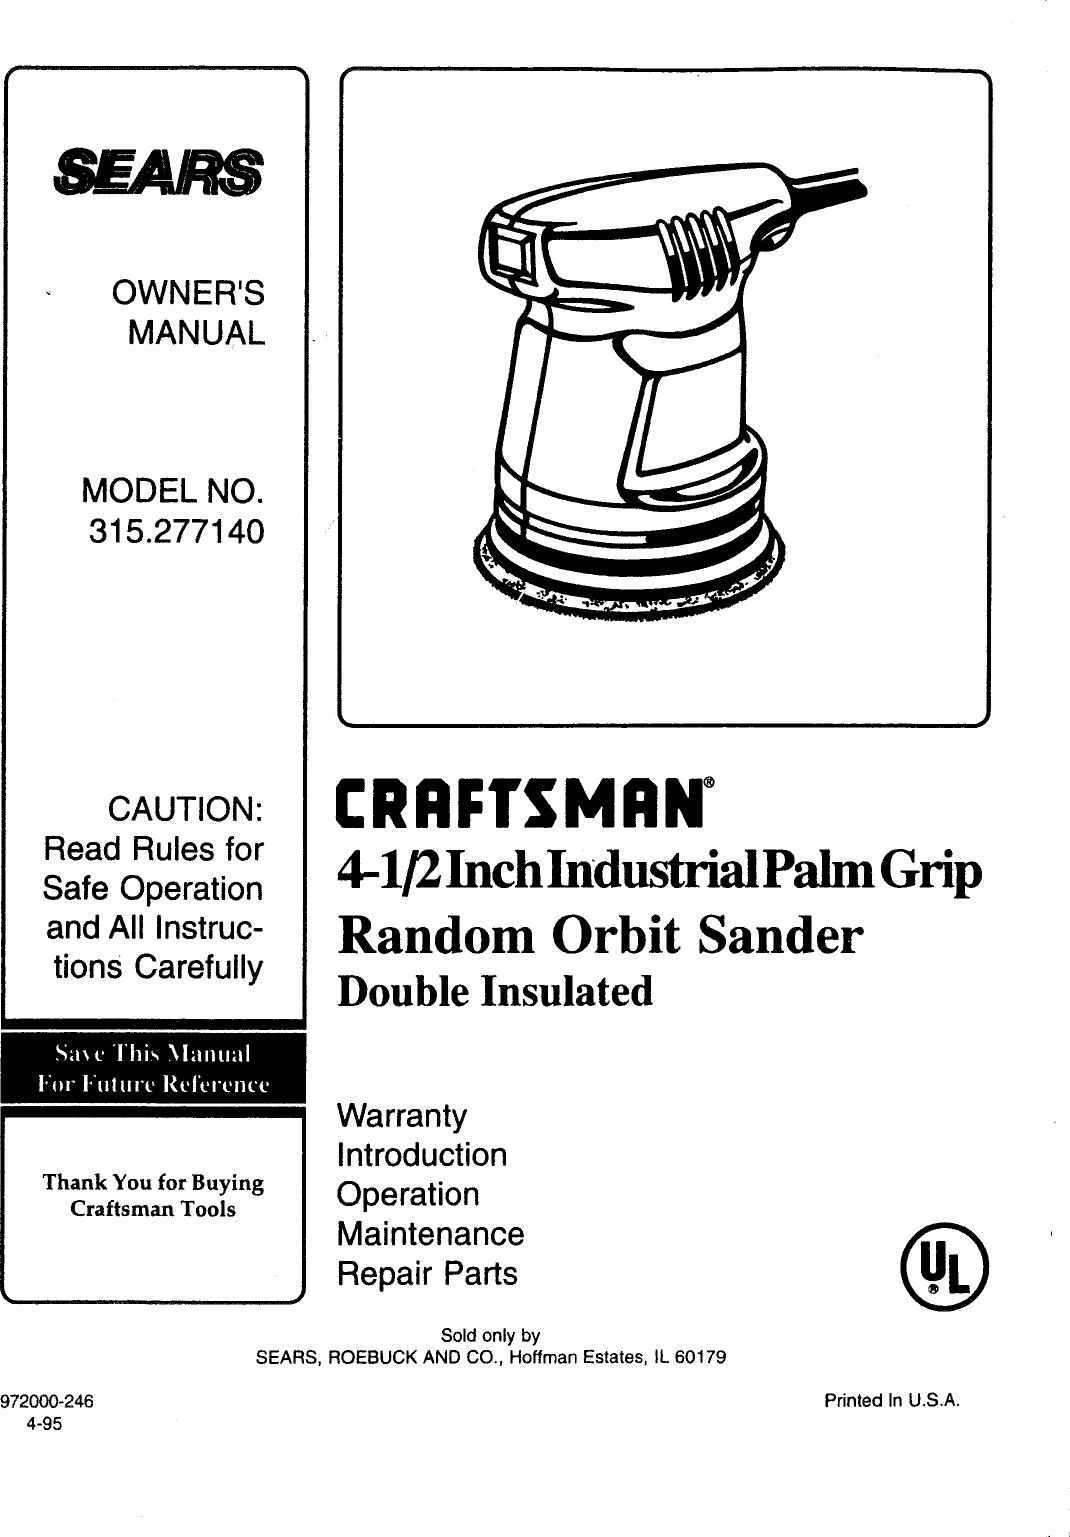 Craftsman 315277140 User Manual ORBIT SANDER Manuals And